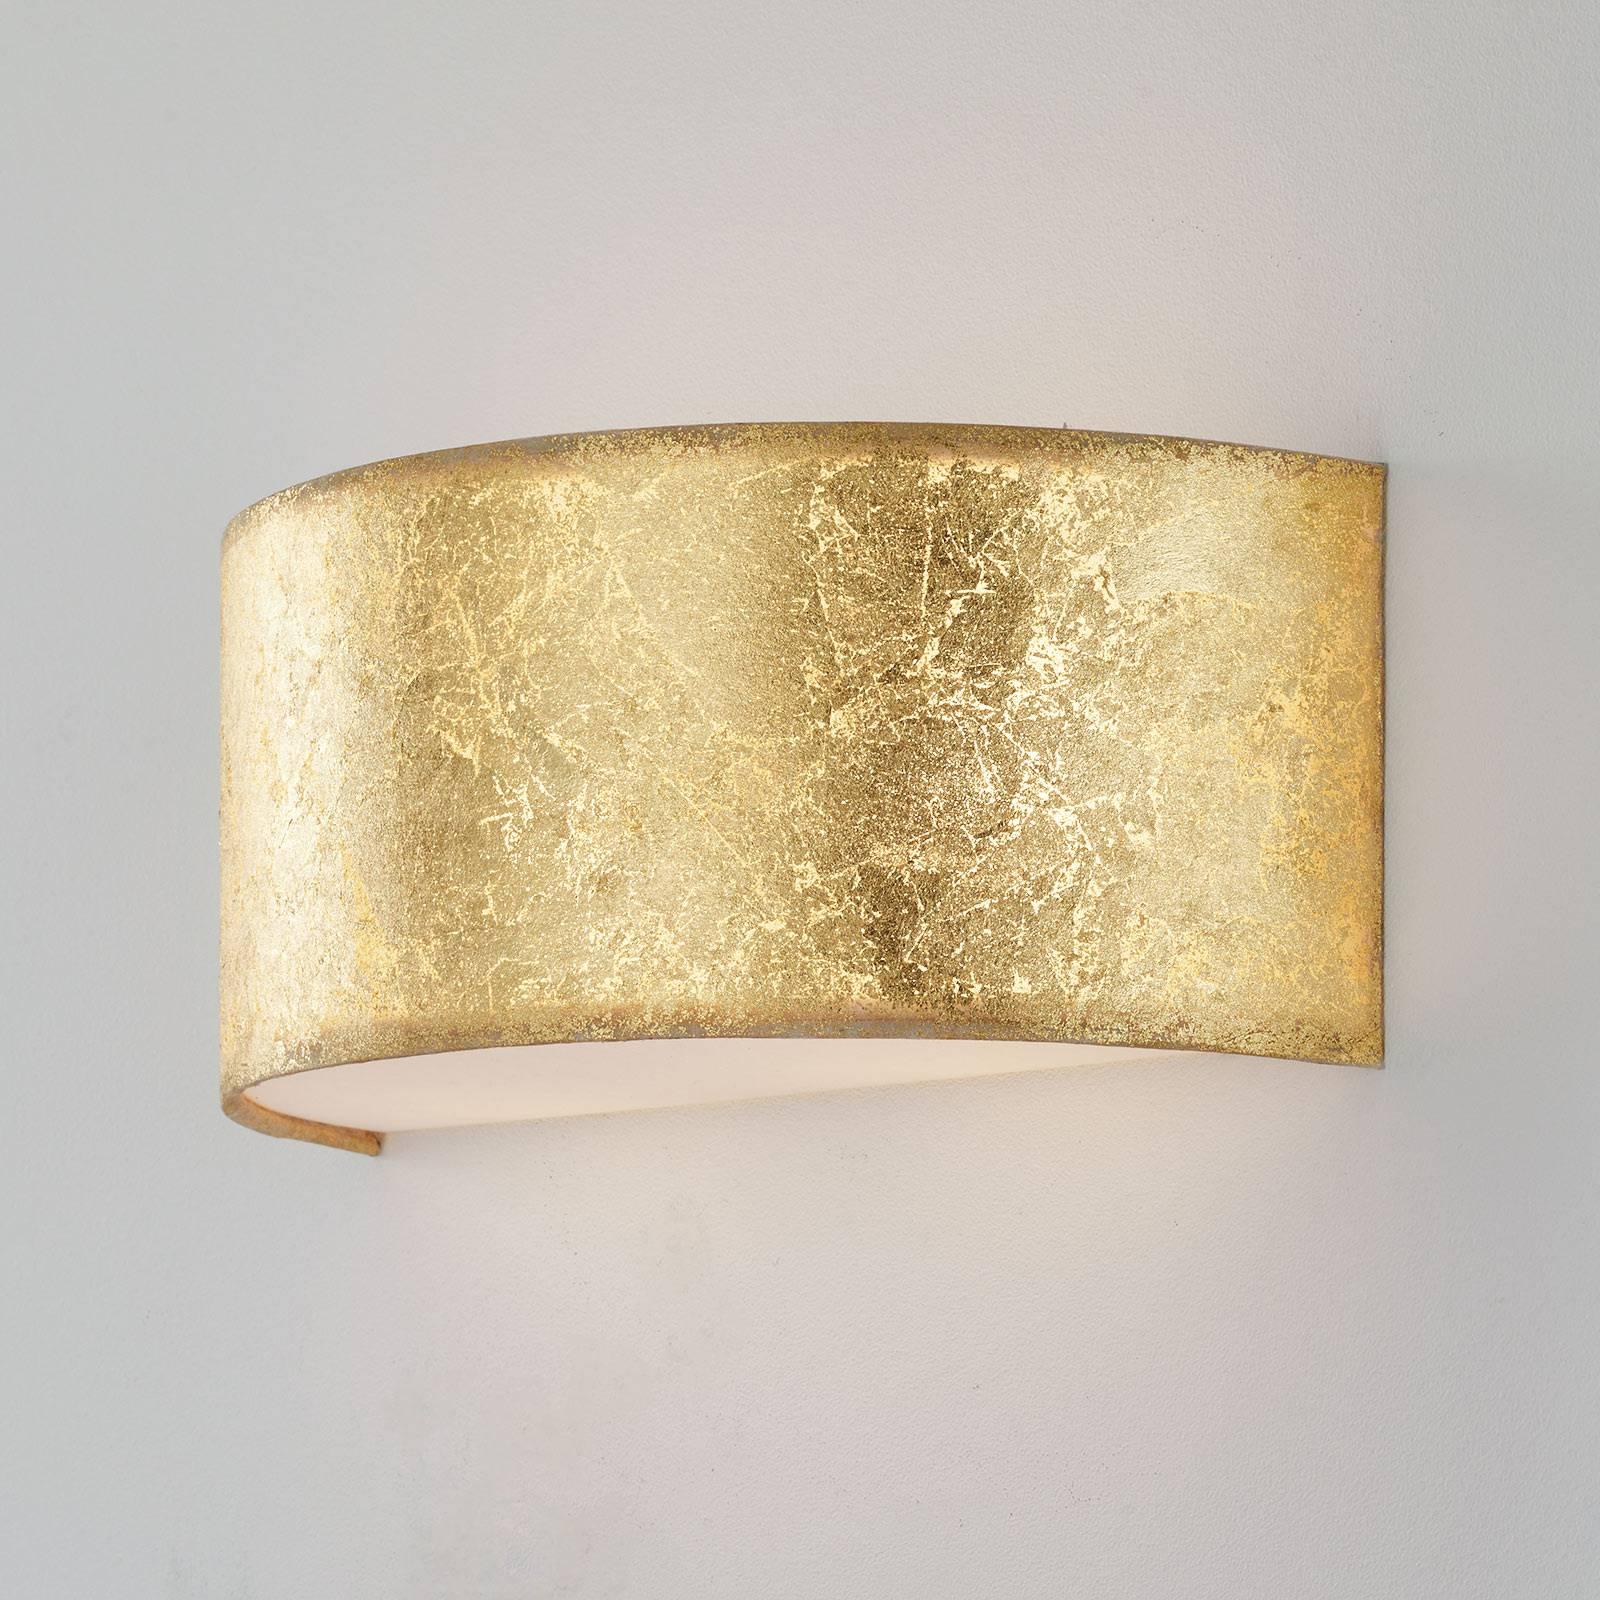 LED-Wandleuchte Alea mit Blattgold dimmbar